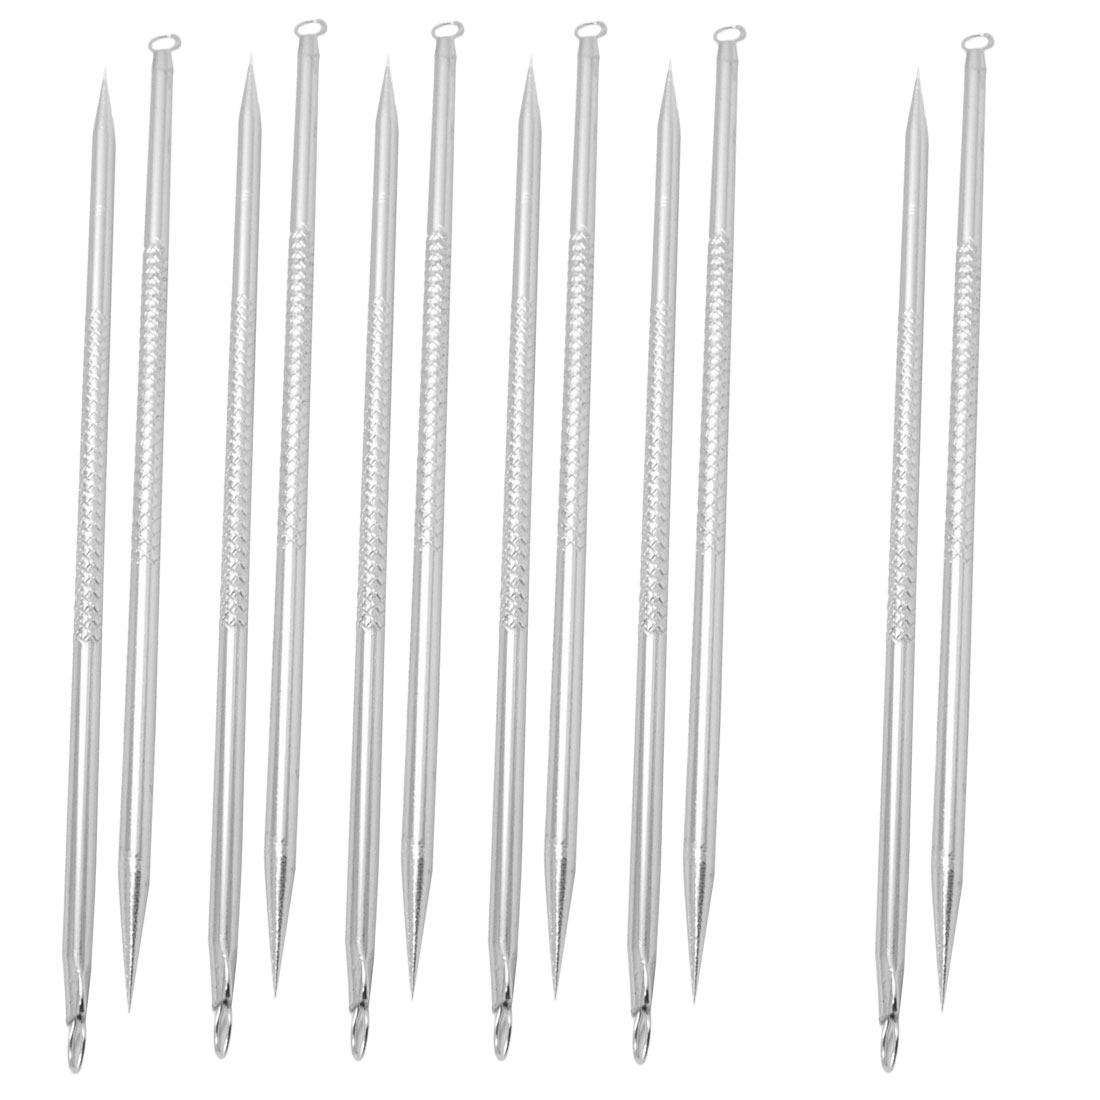 12 Pcs Blemish Blackhead Extractor Acne Removers Needles Beauty Tools